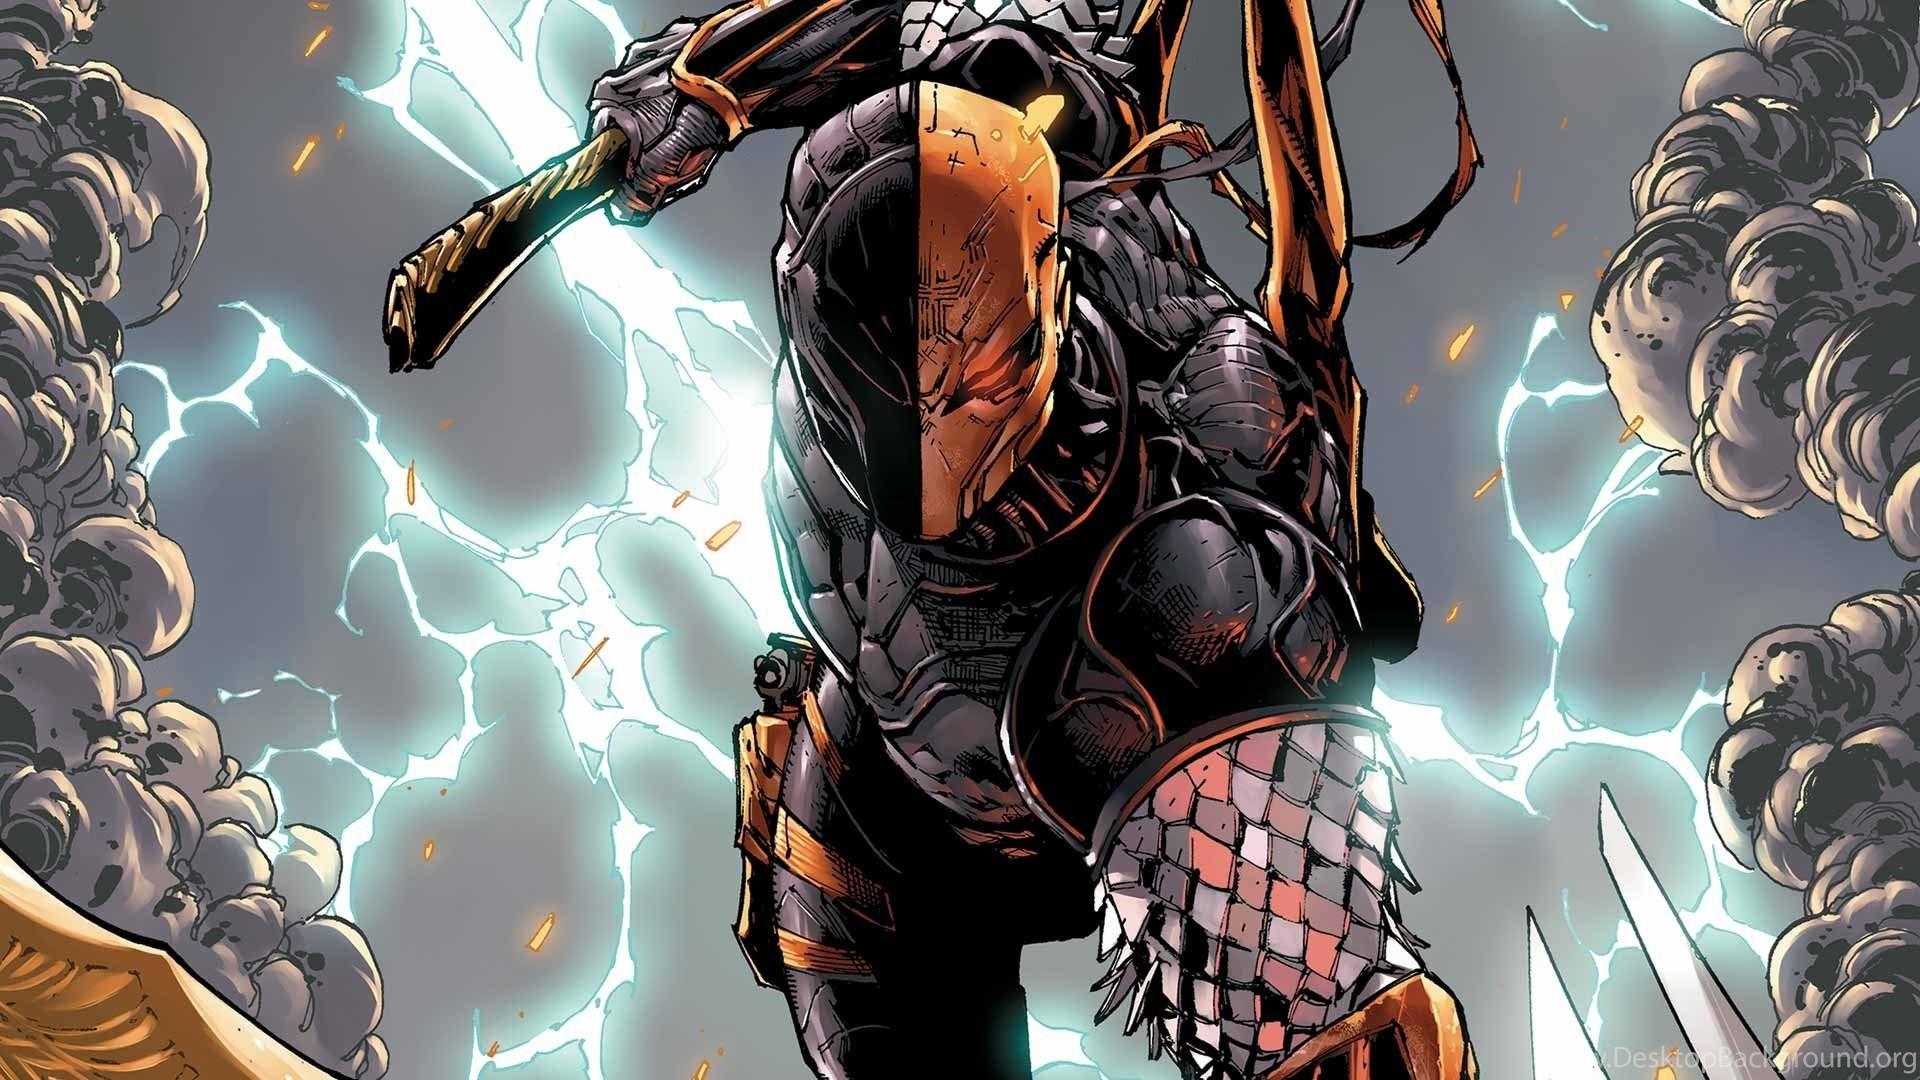 2048x2048 Preview Wallpaper Batman Arkham Origins Deathstroke Warner Bros Games Montreal Dc Comics